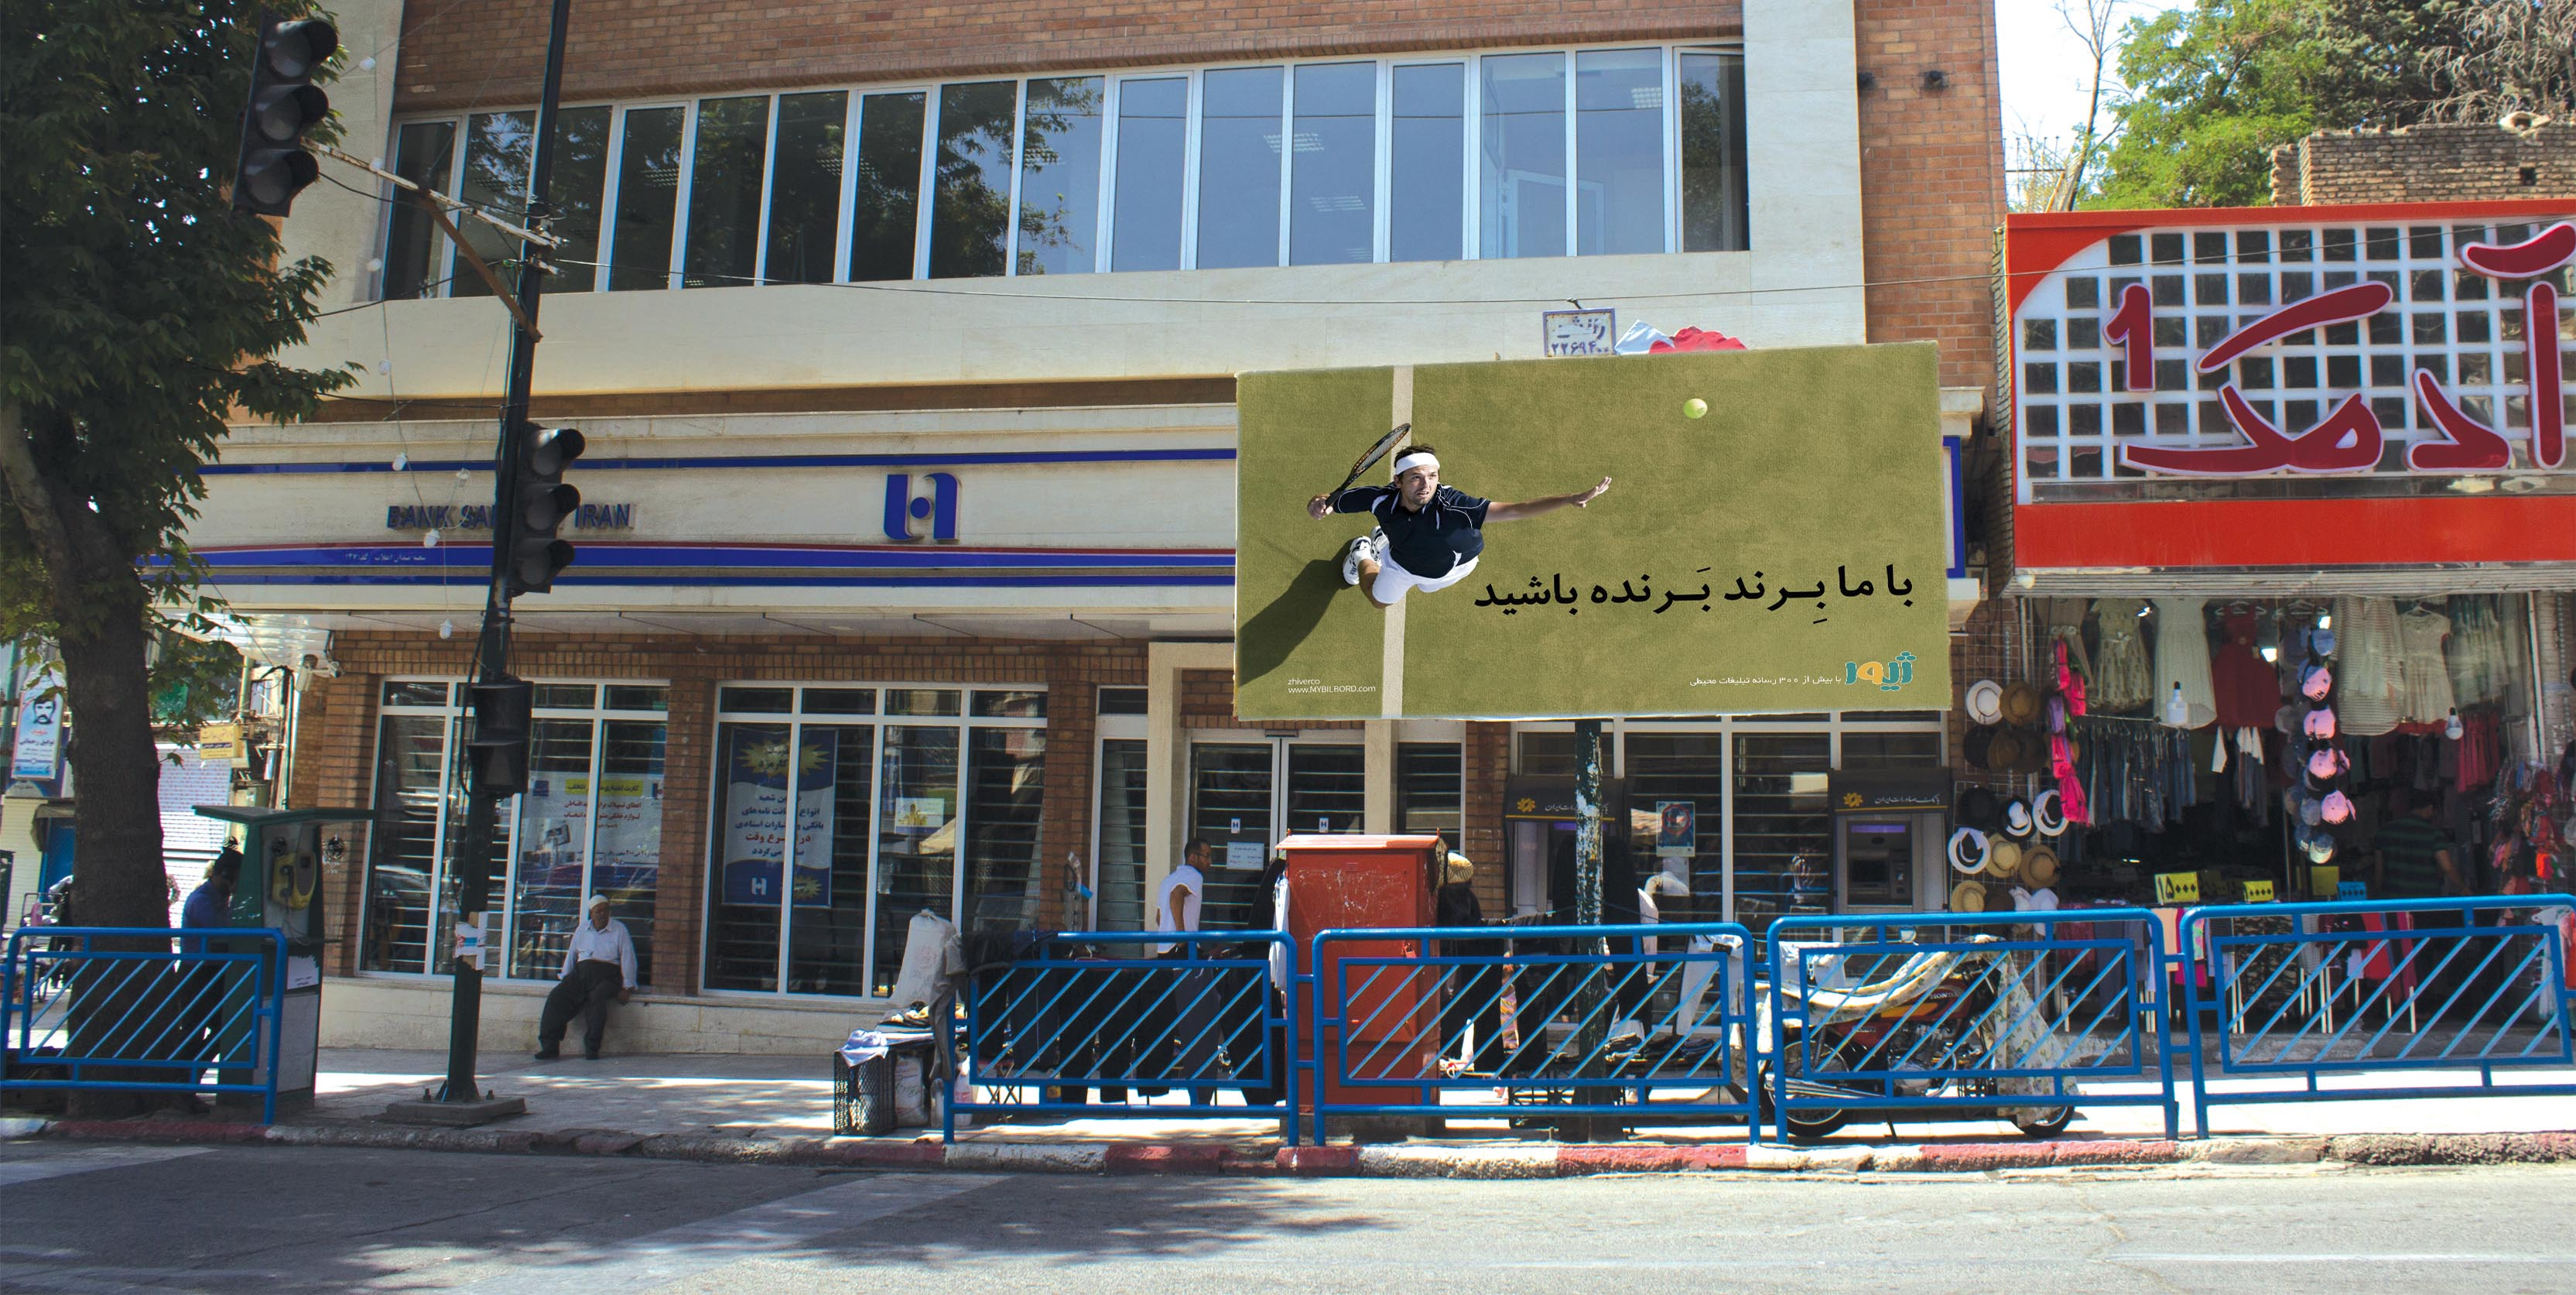 بیلبورد تبلیغاتی میدان انقلاب سنندج نبش خیابان امام جنب بانک صادرات